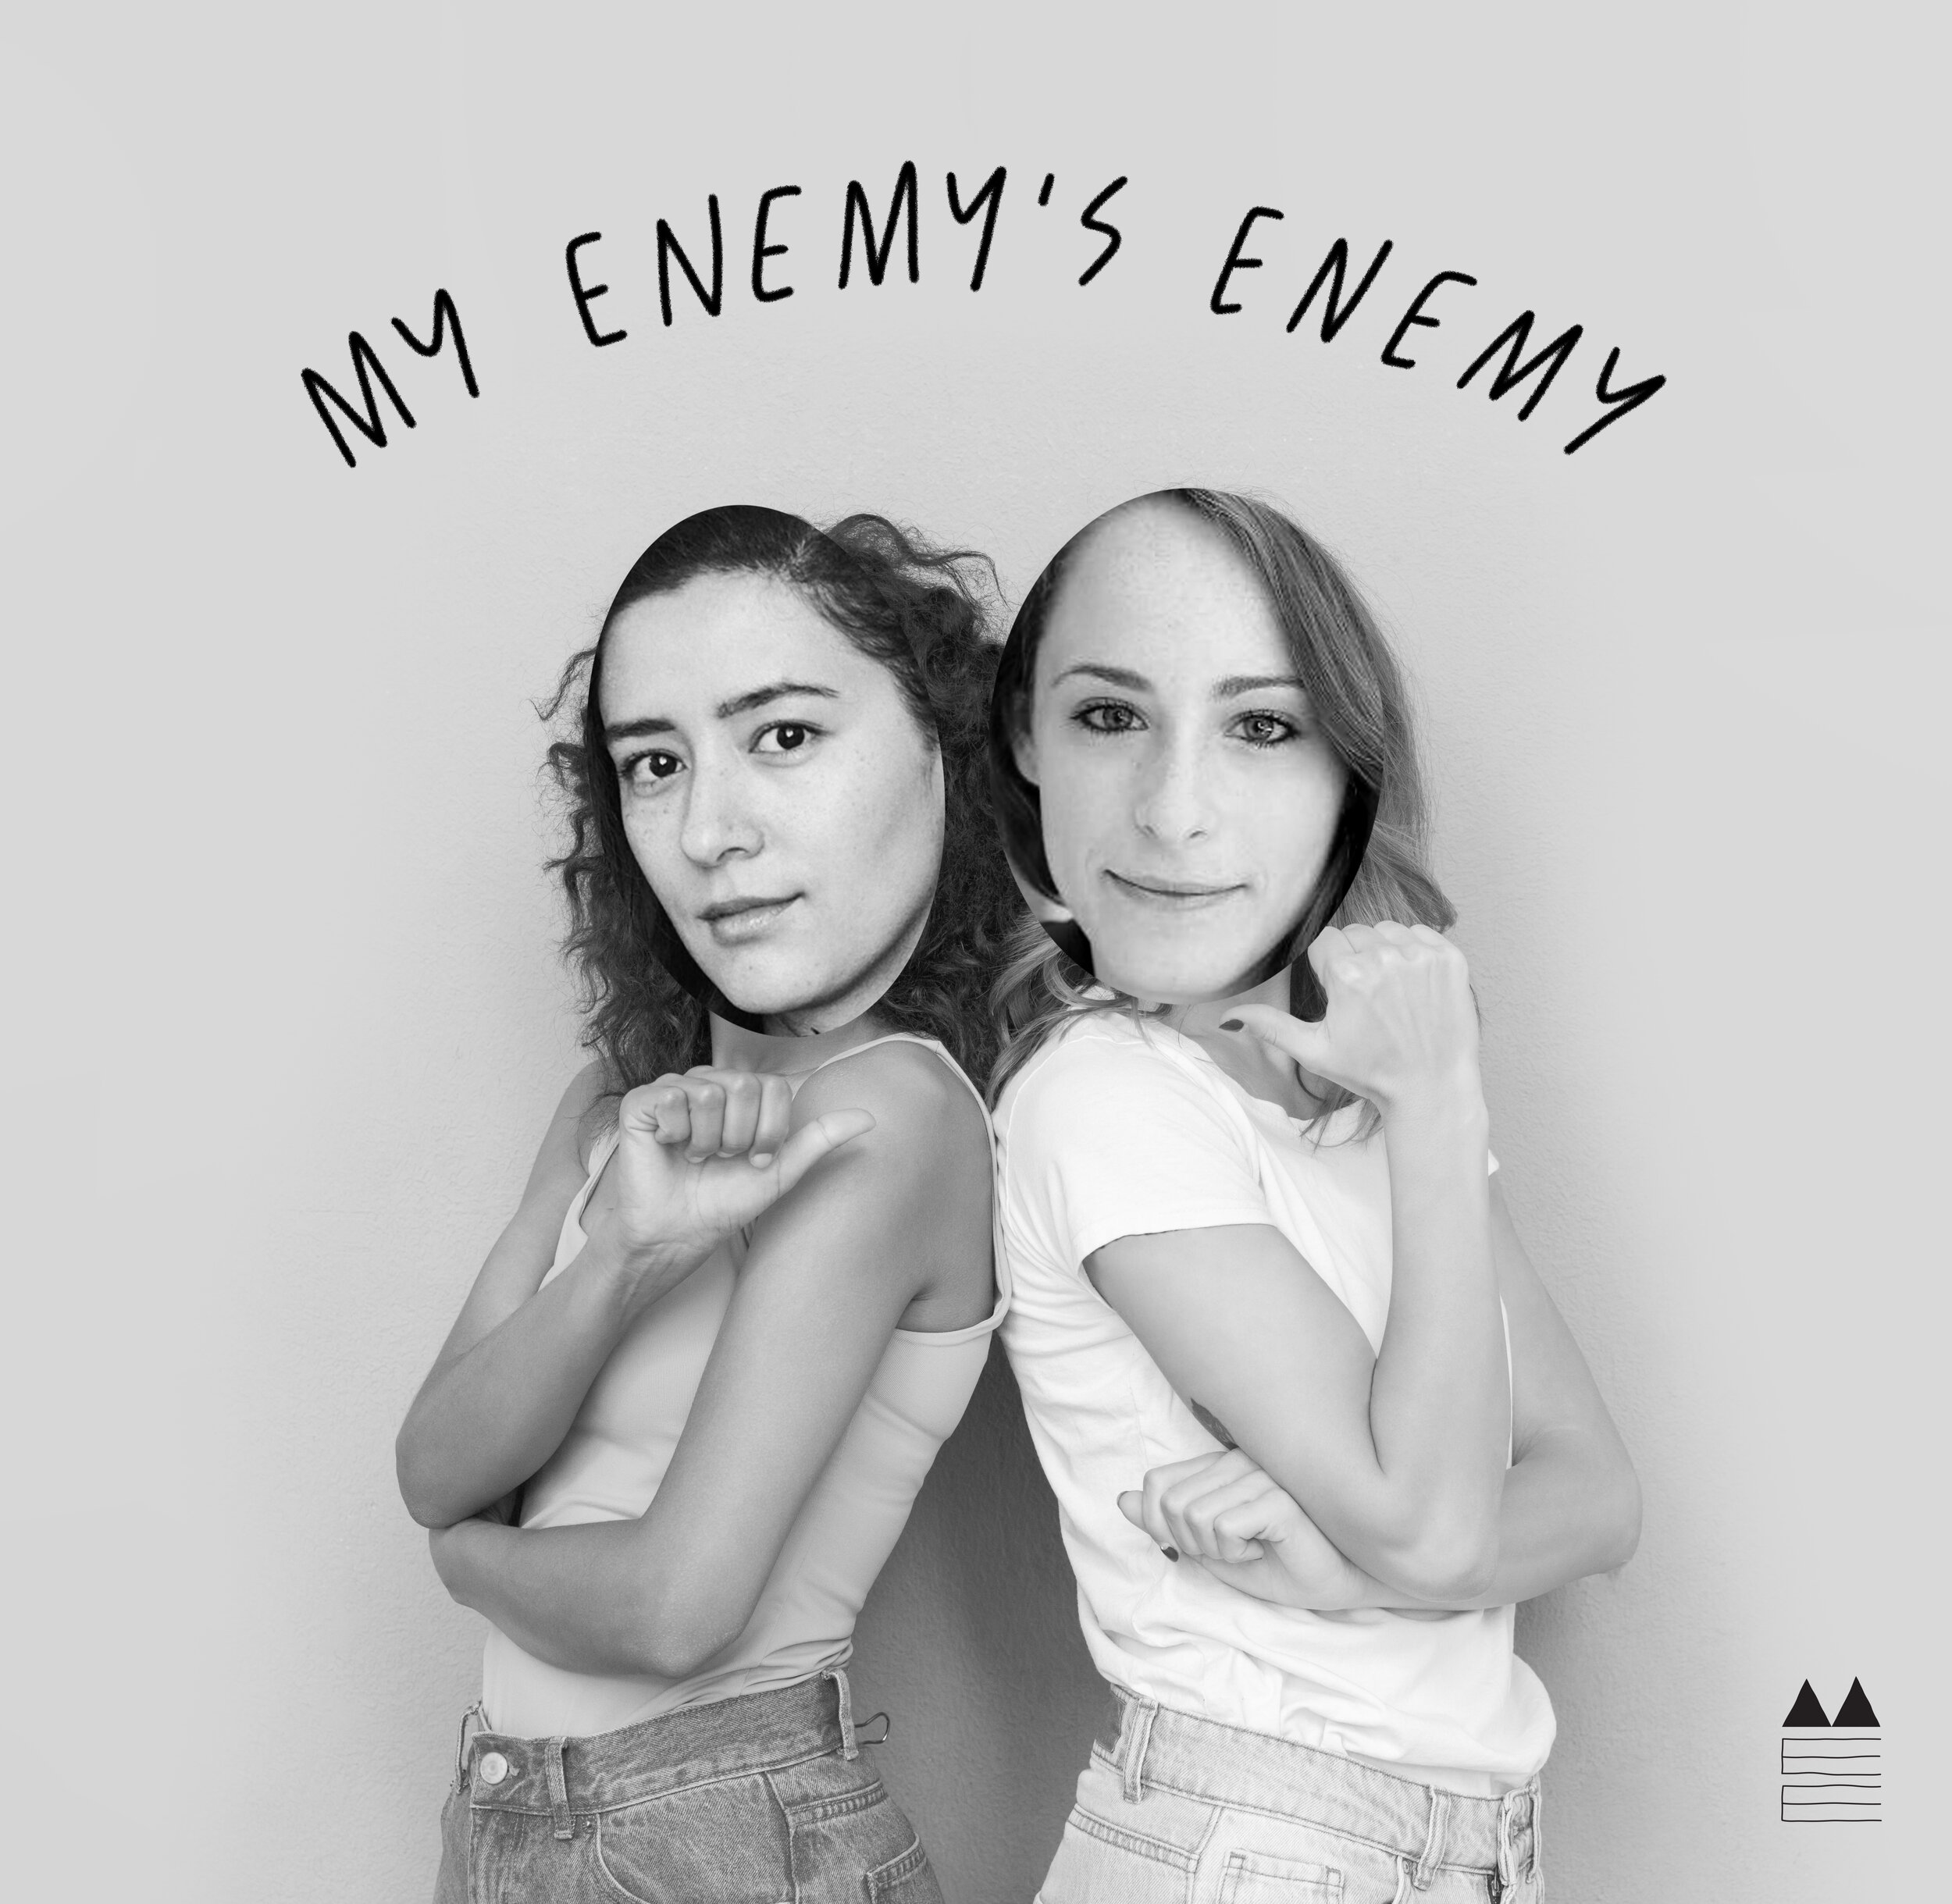 MY ENEMY'S ENEMY - Illustrator & Writer Team